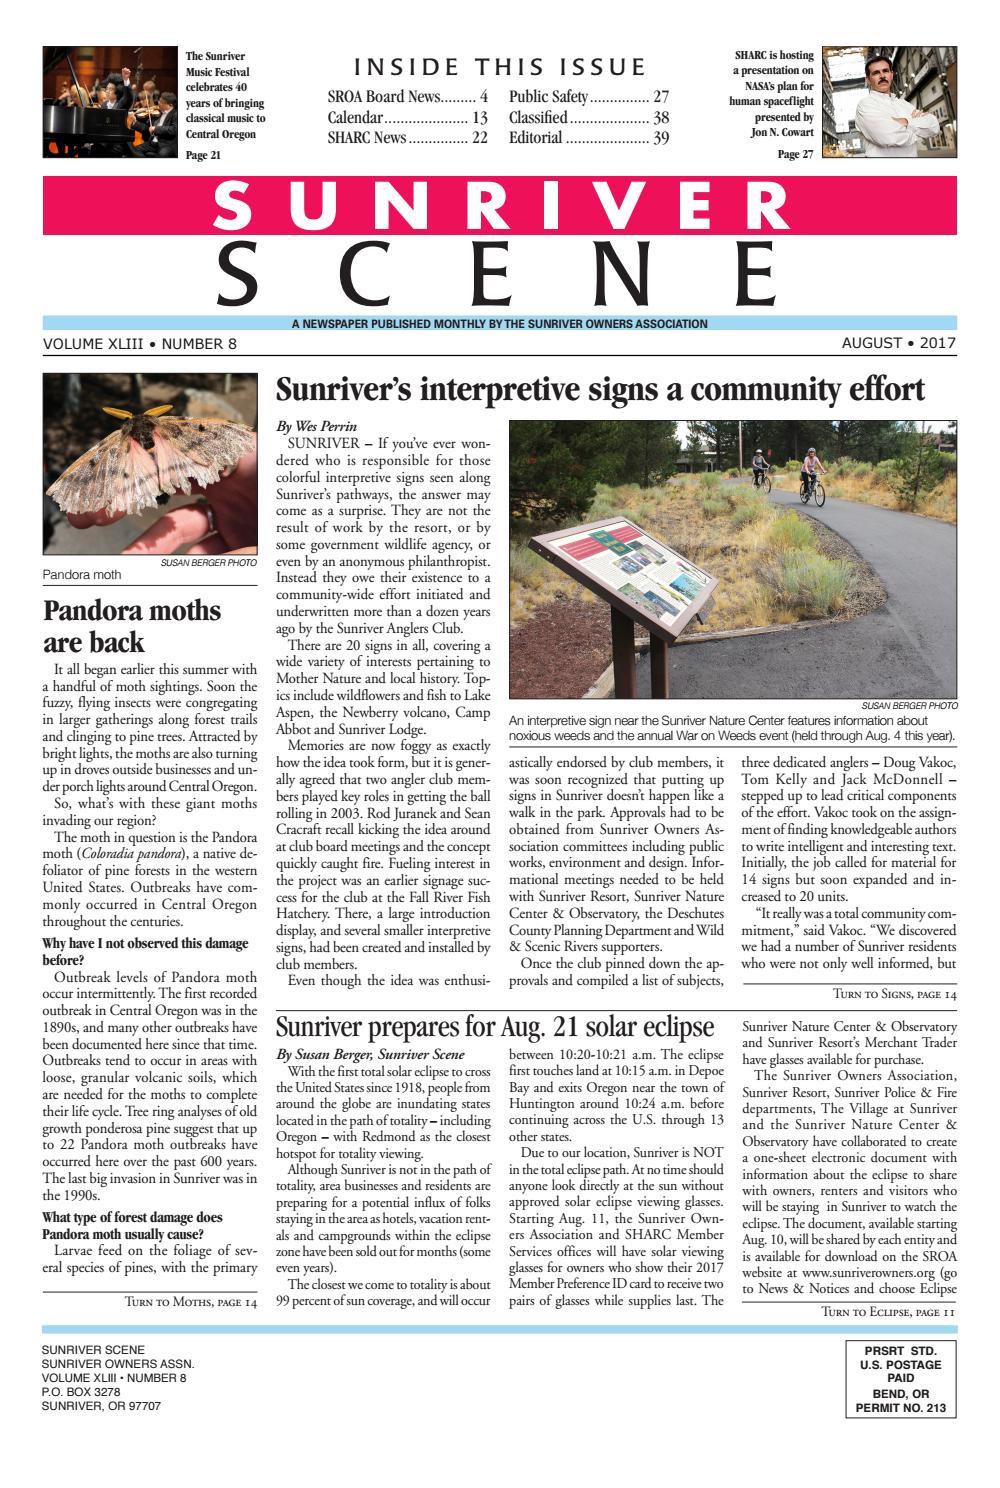 Sunriver Scene August 2017 by Sunriver Scene - issuu